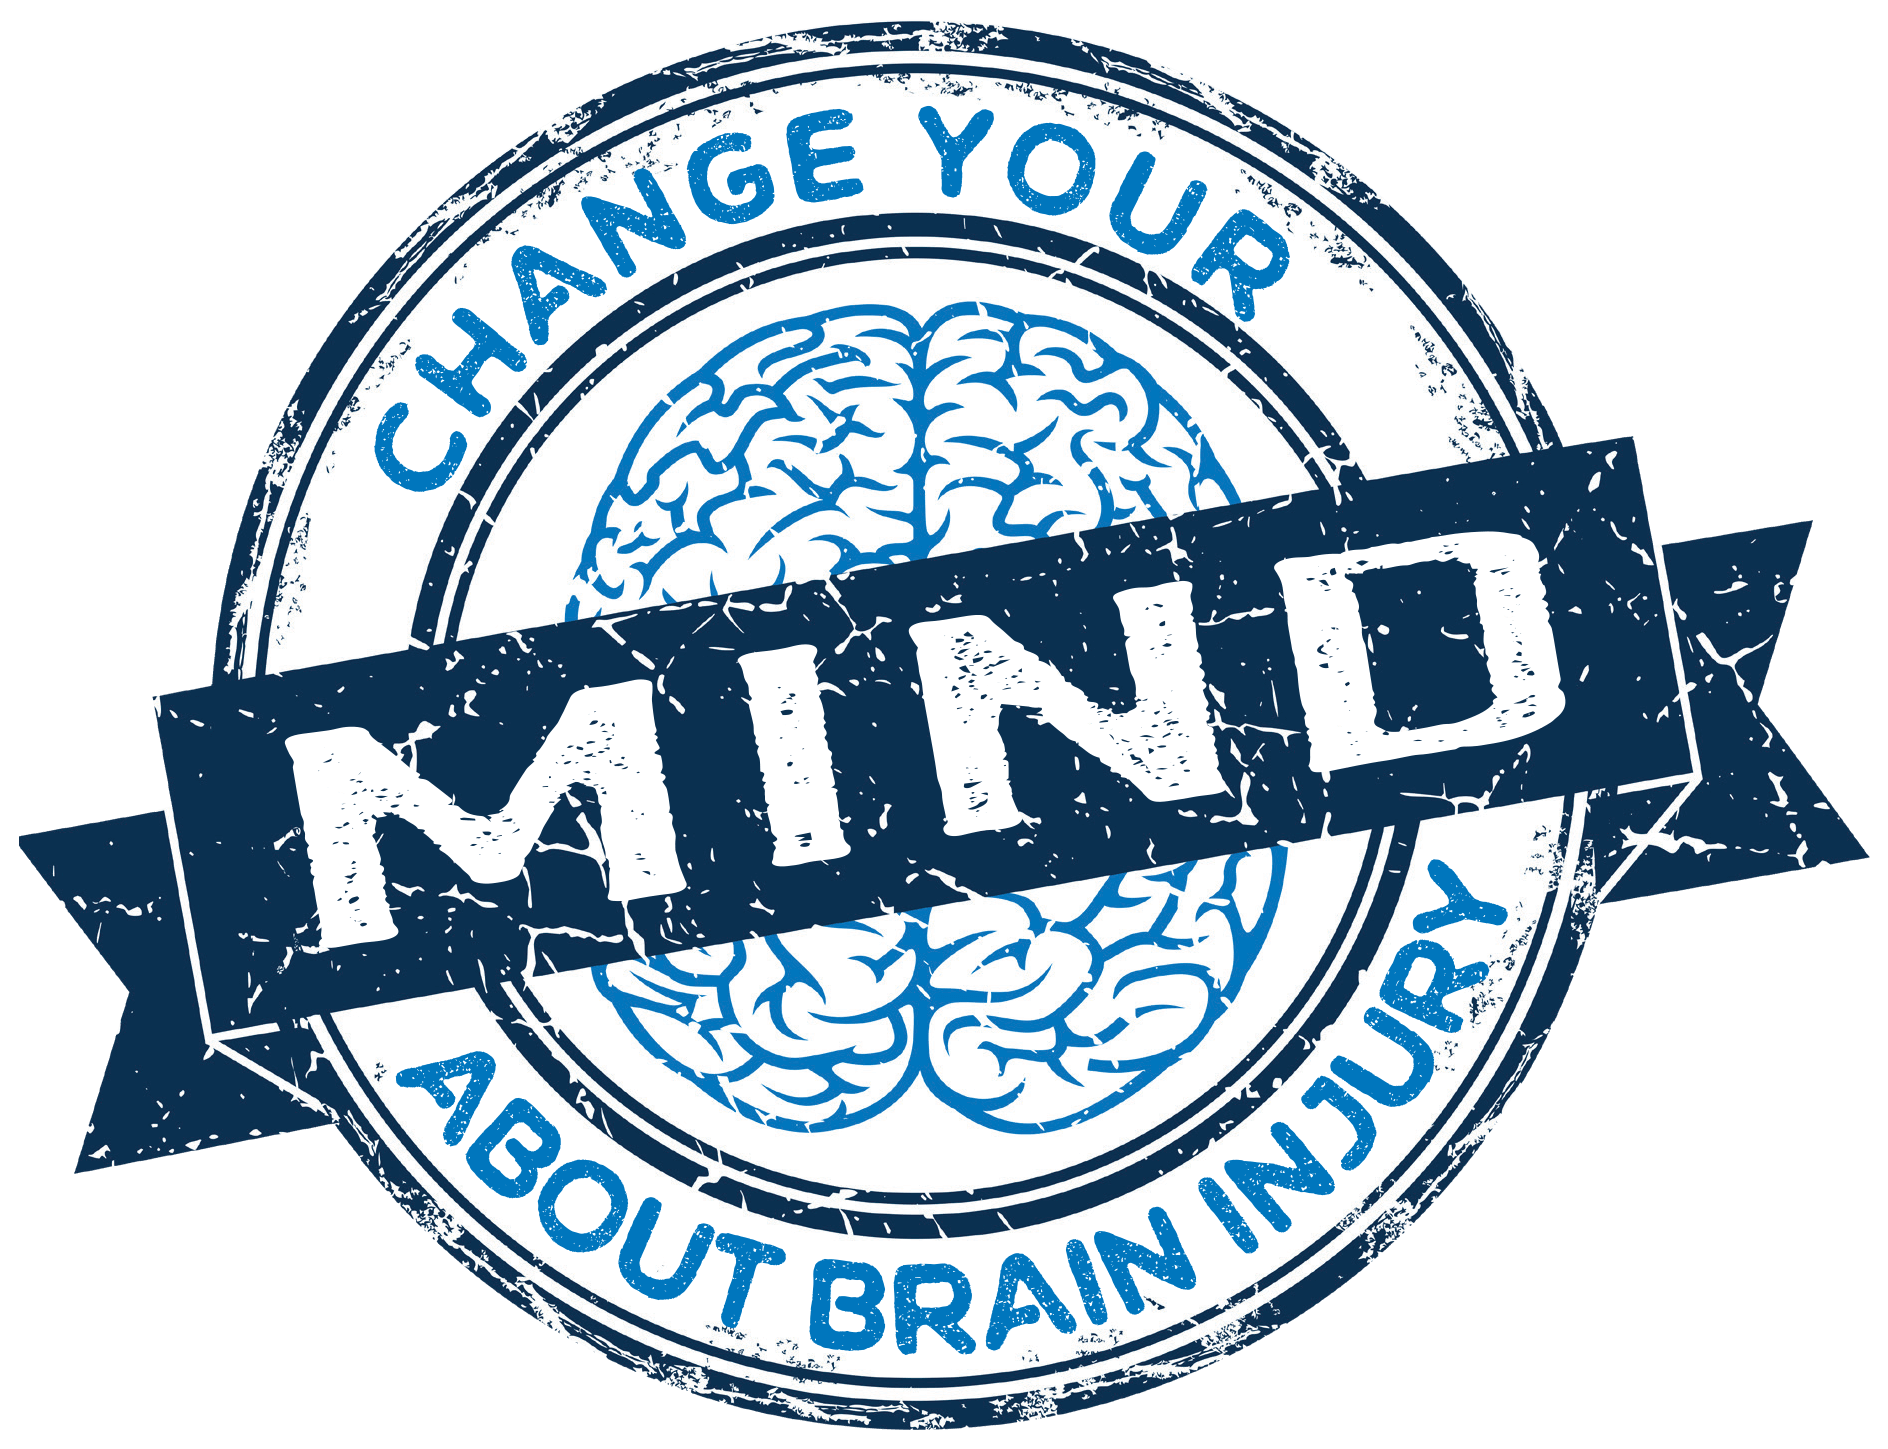 #ChangeYourMind Stamp Download Preview